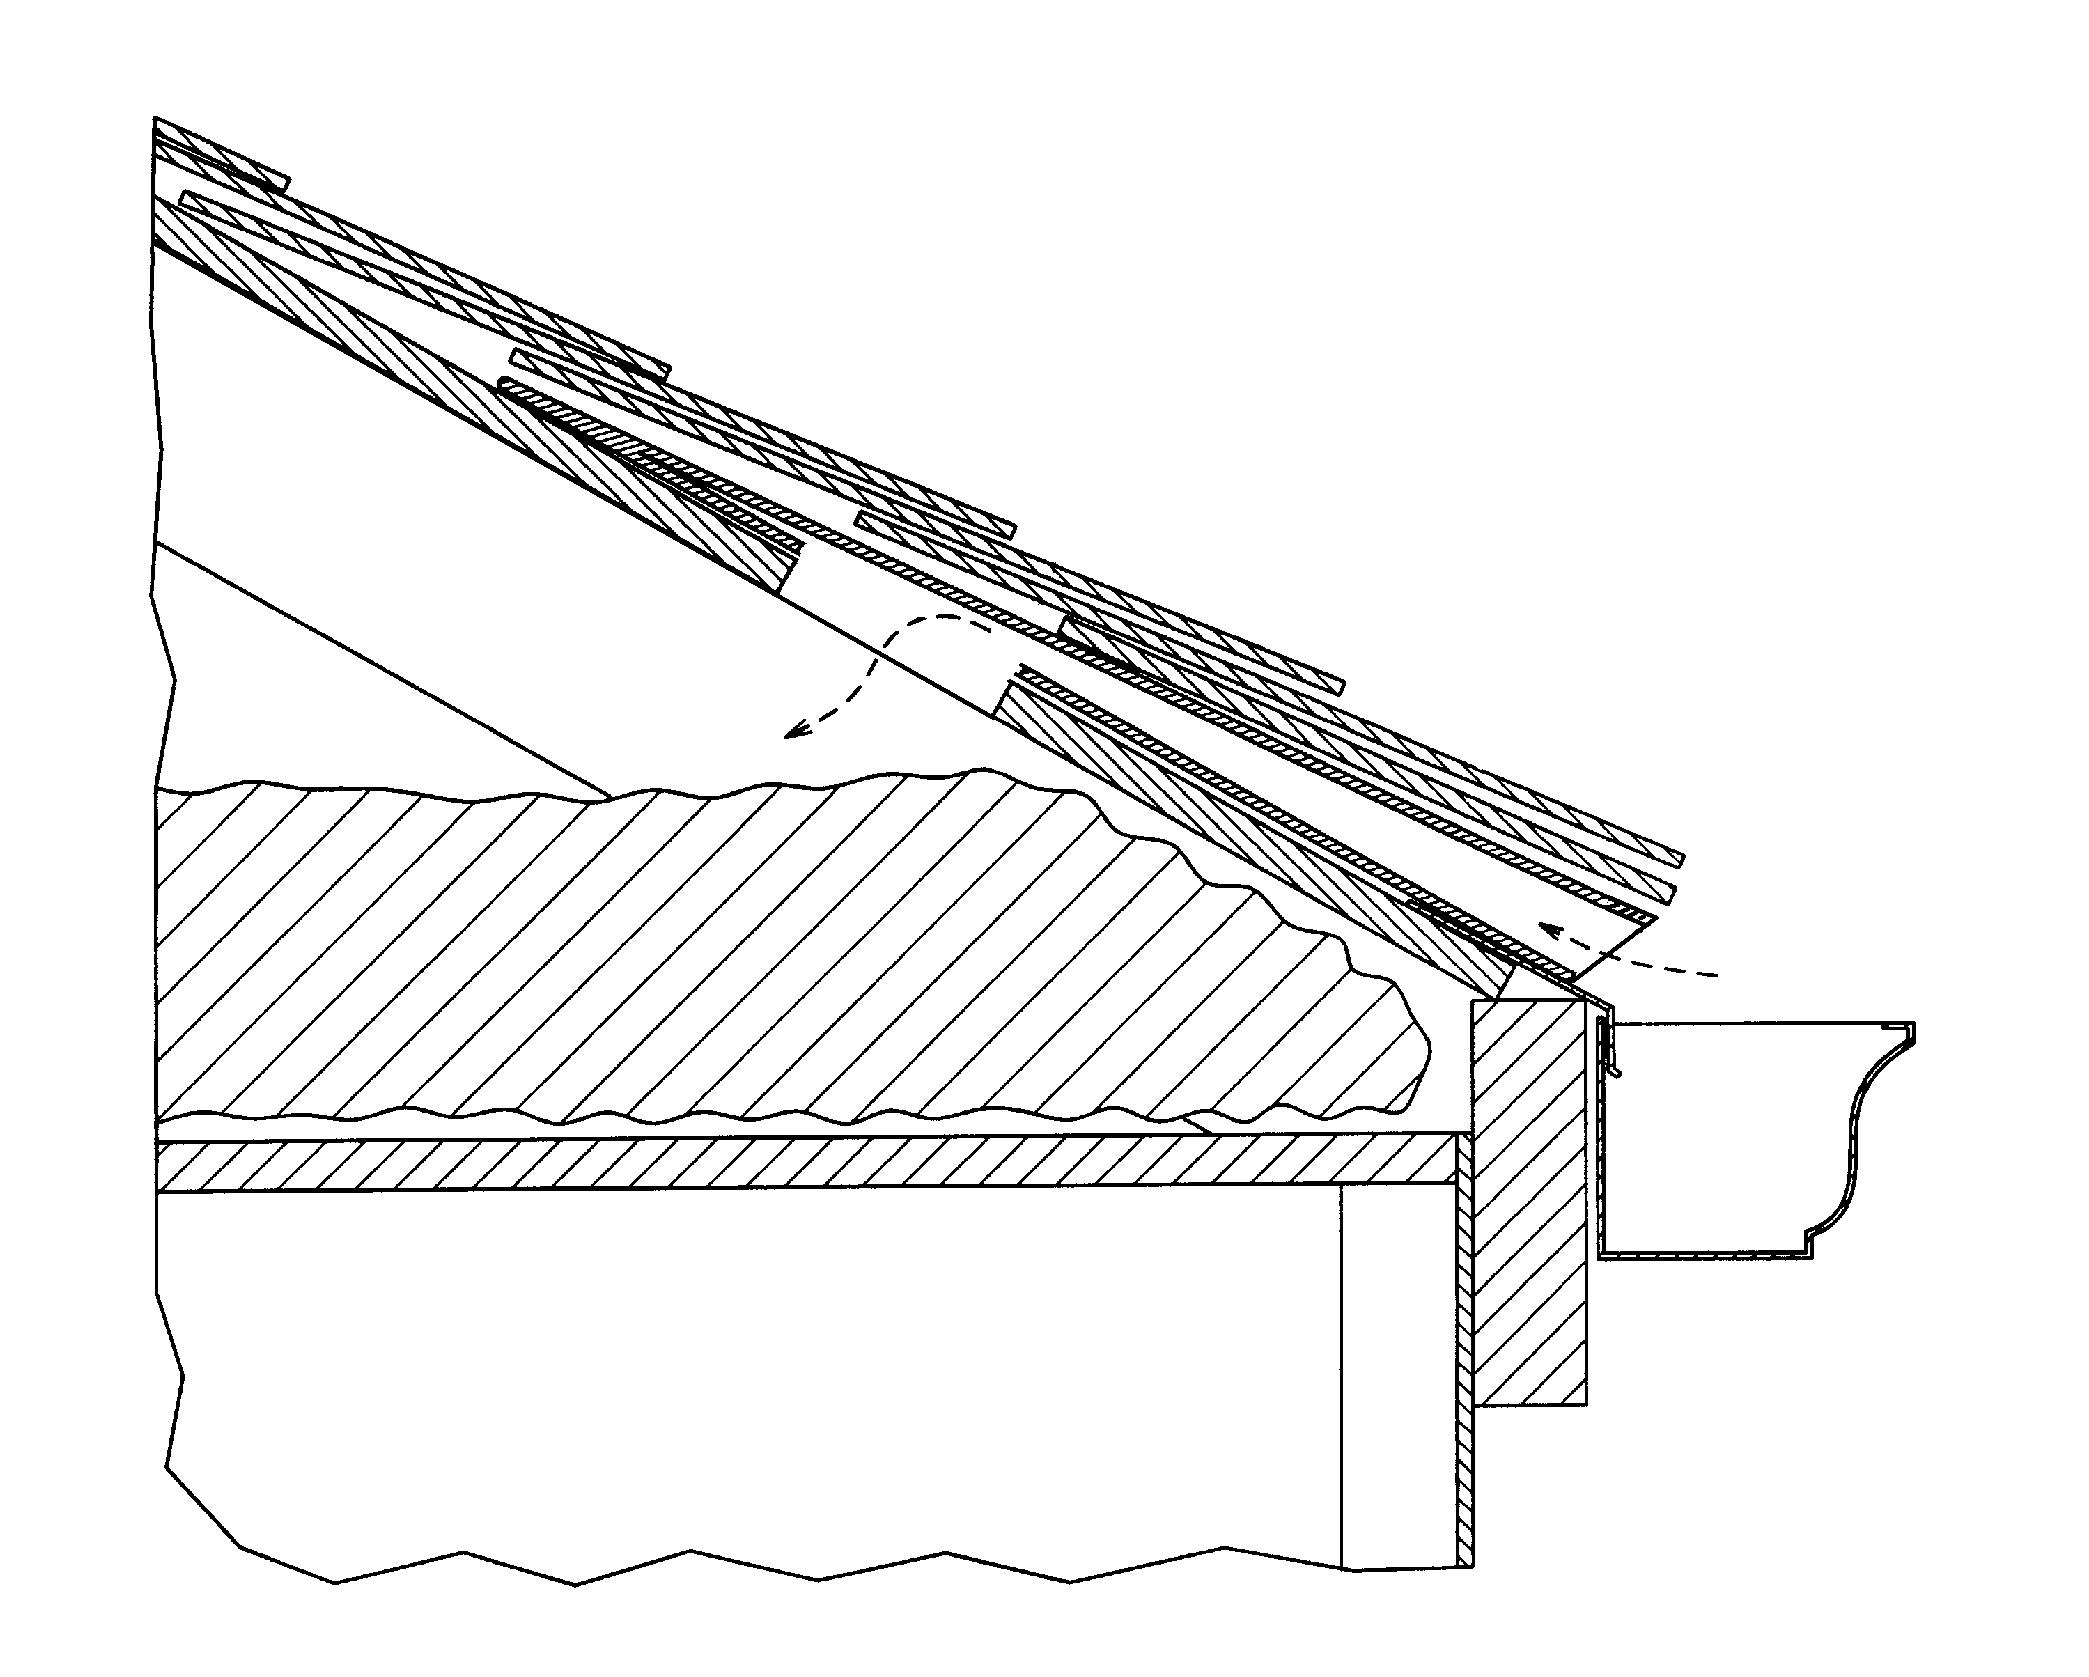 The edge vent